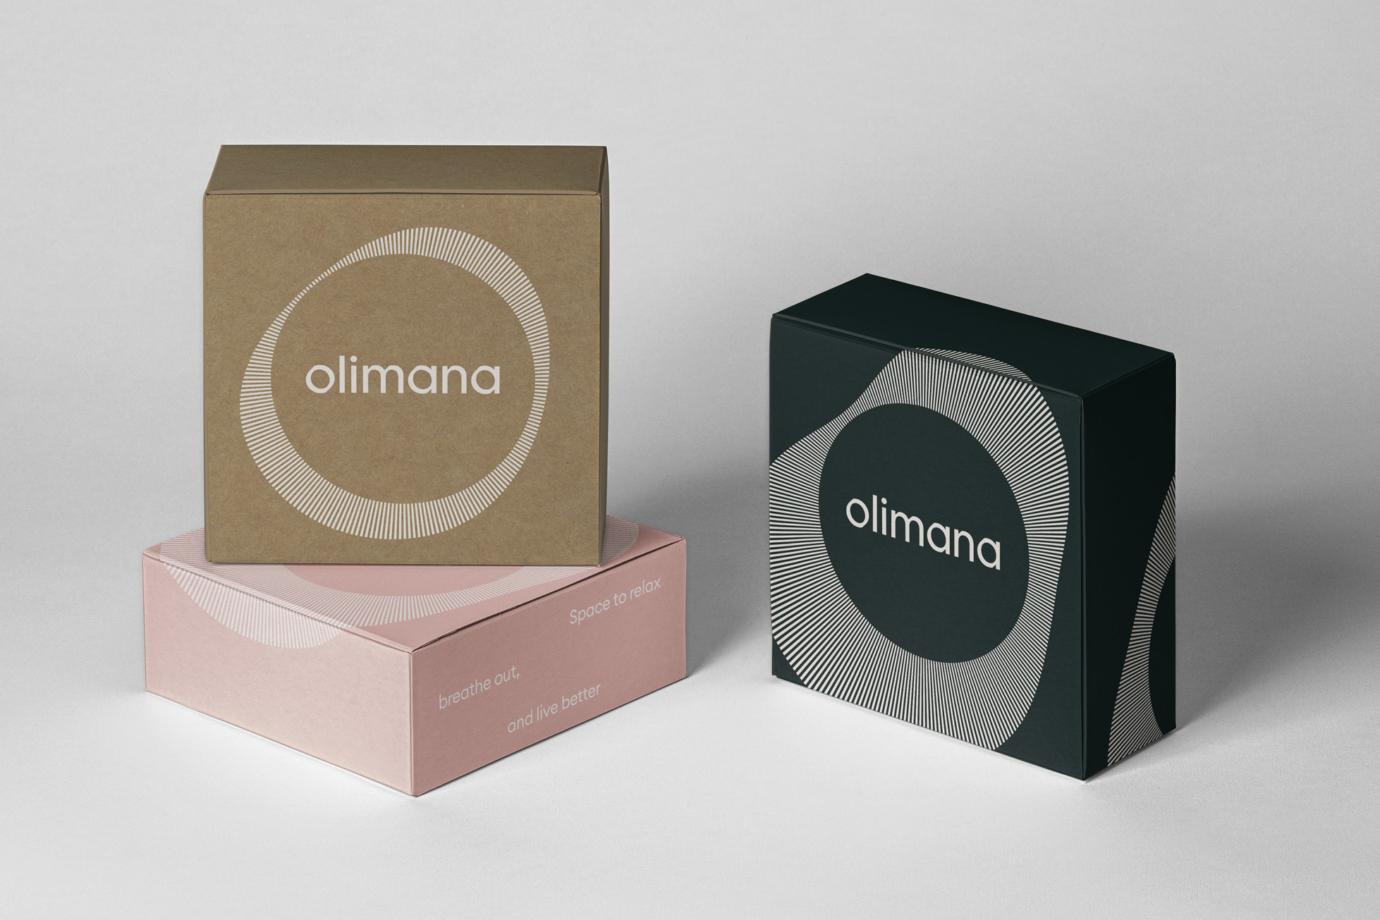 https://spystudio.co.uk/wp-content/uploads/2021/03/Spy-Olimana-boxes-w-1380x920.jpg